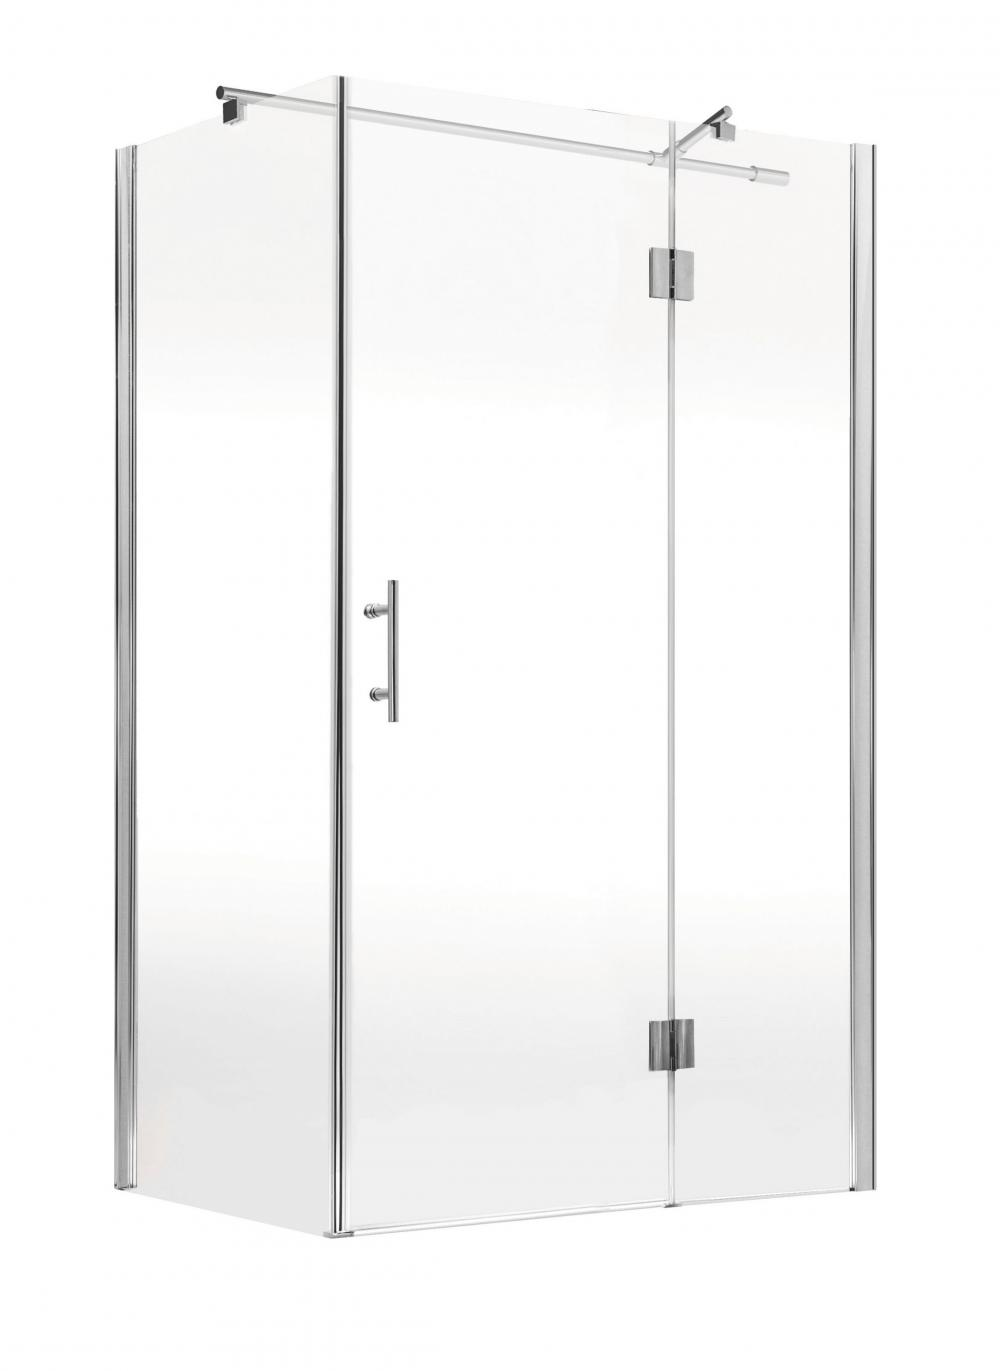 Deante Abelia szögletes zuhanykabin 100x80 cm